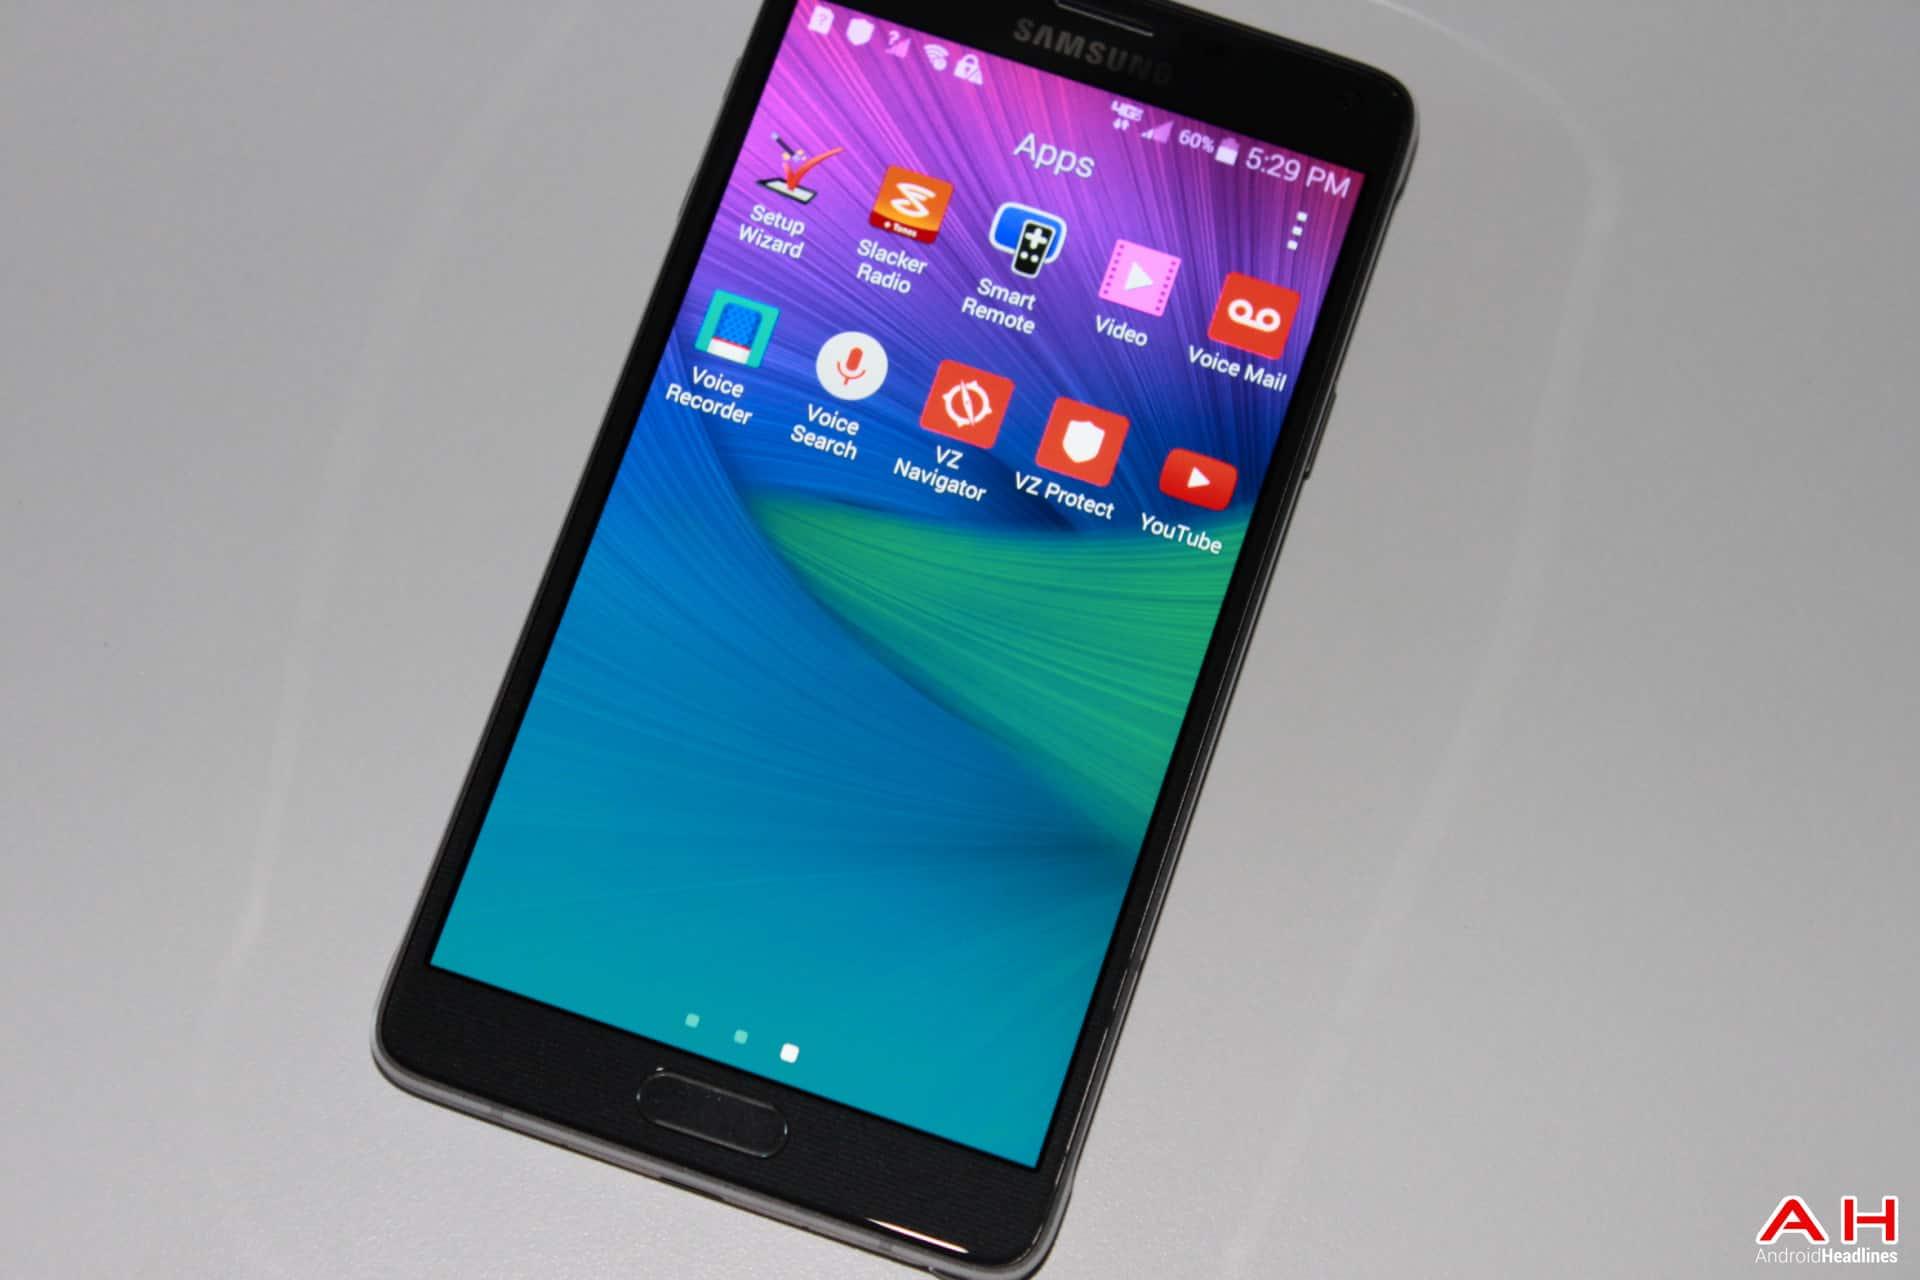 AH Samsung Galaxy Note 4-45